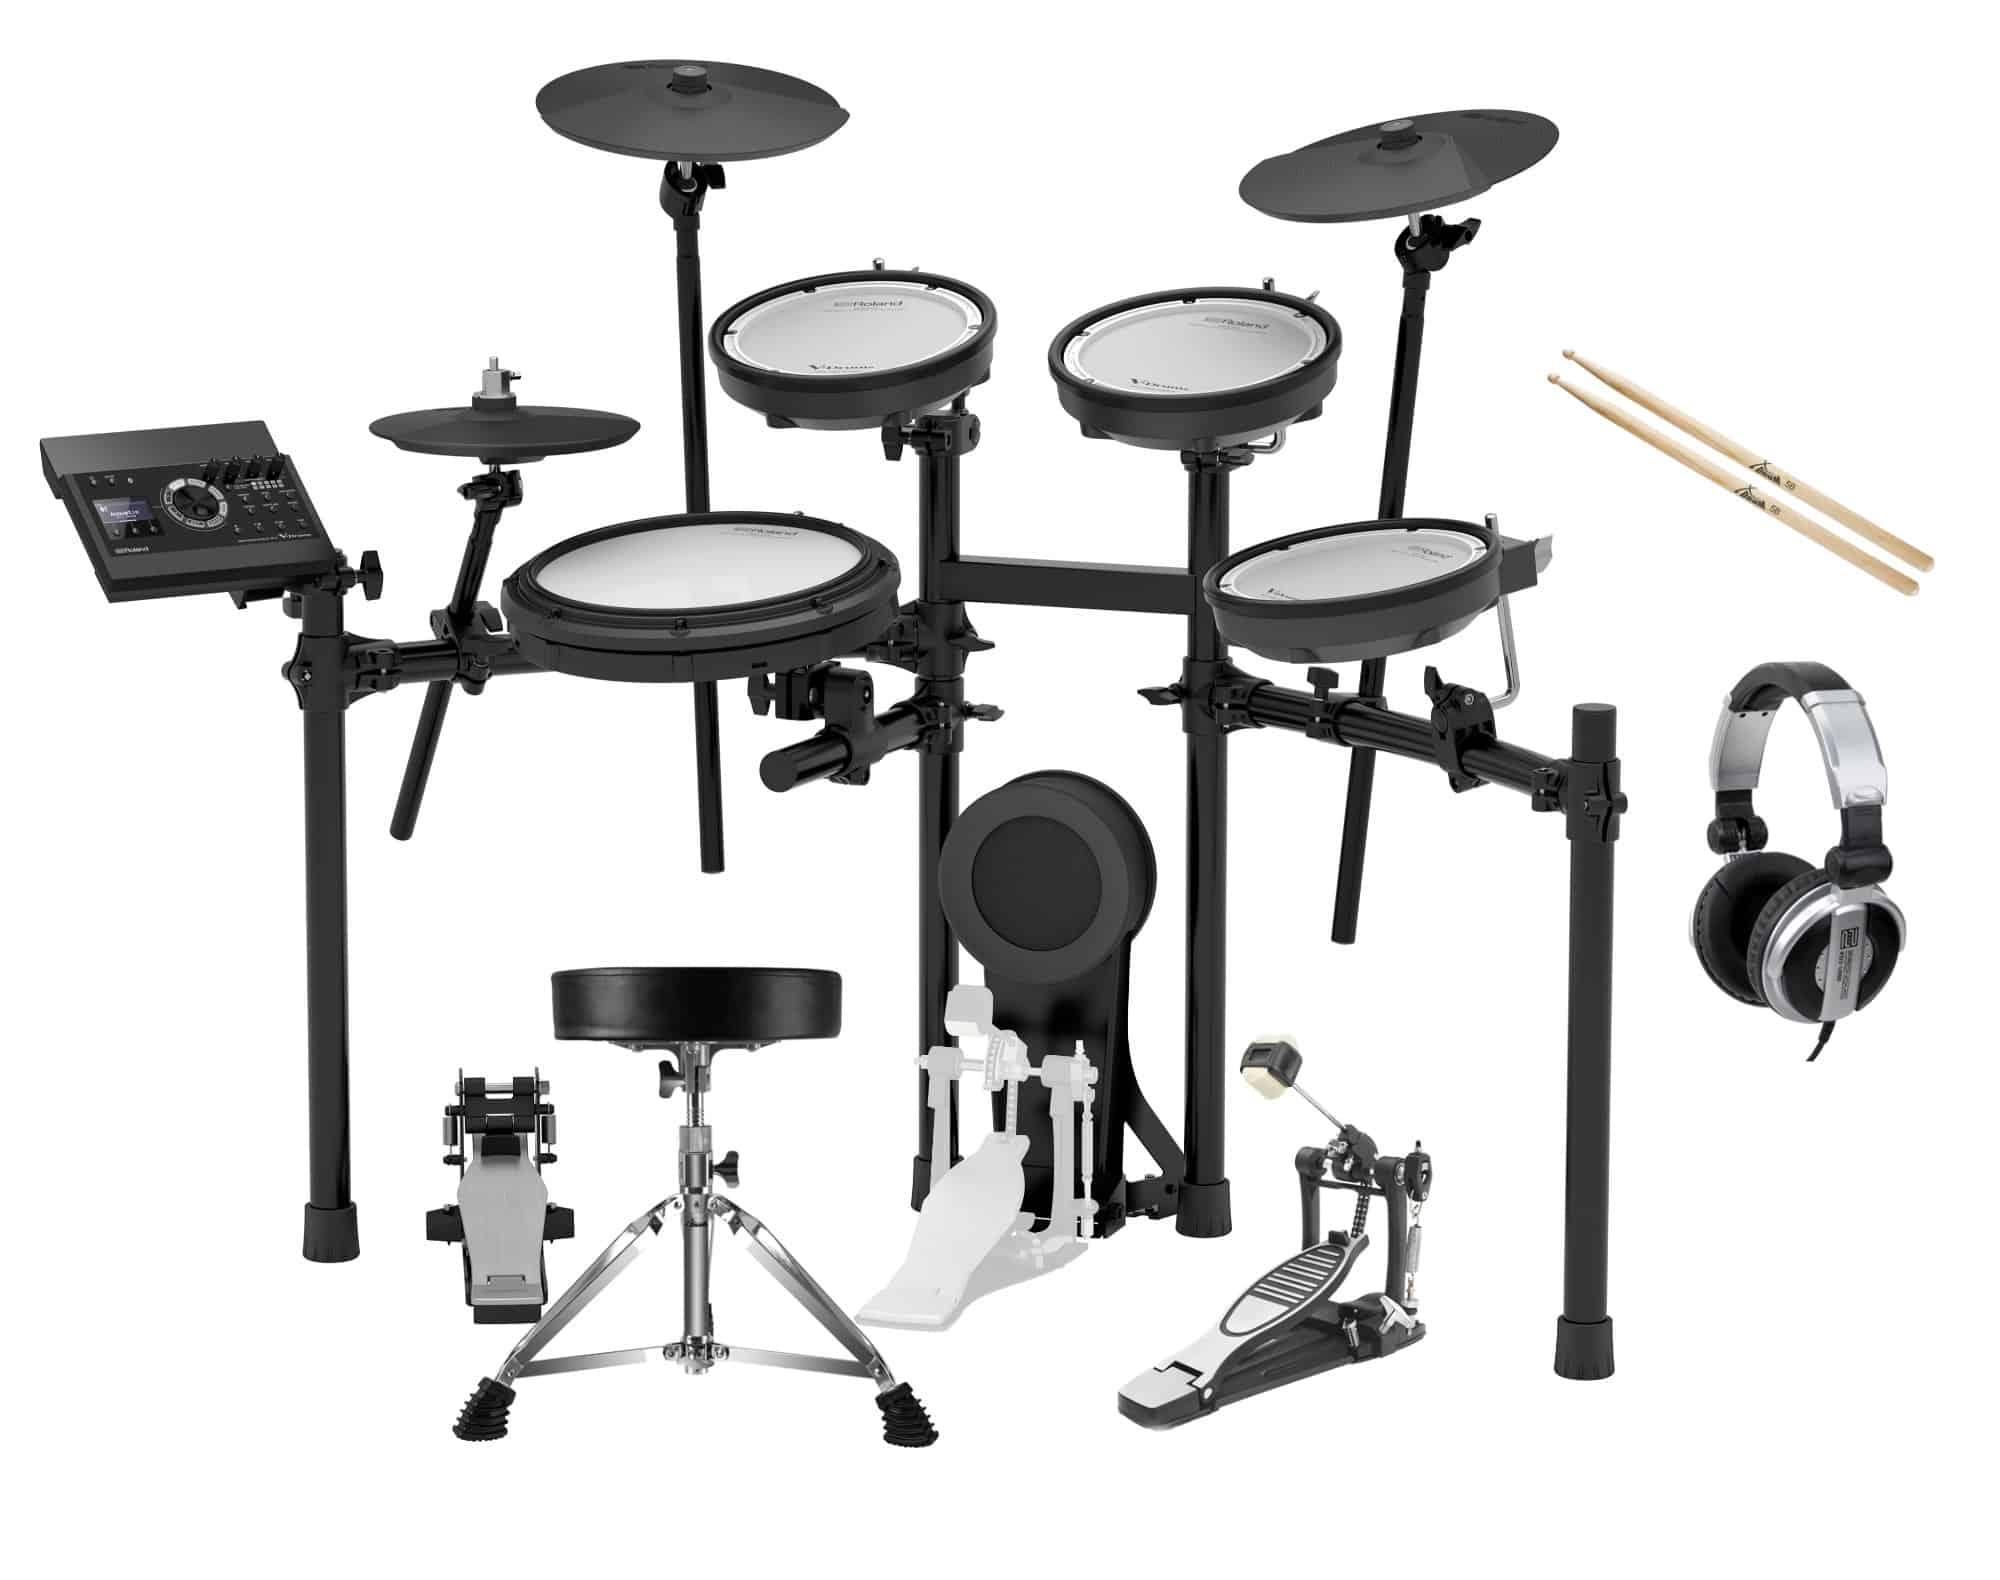 Roland TD 17KV V Drum Kit Set inkl. Hocker, Sticks, Fußmaschine Kopfhörer